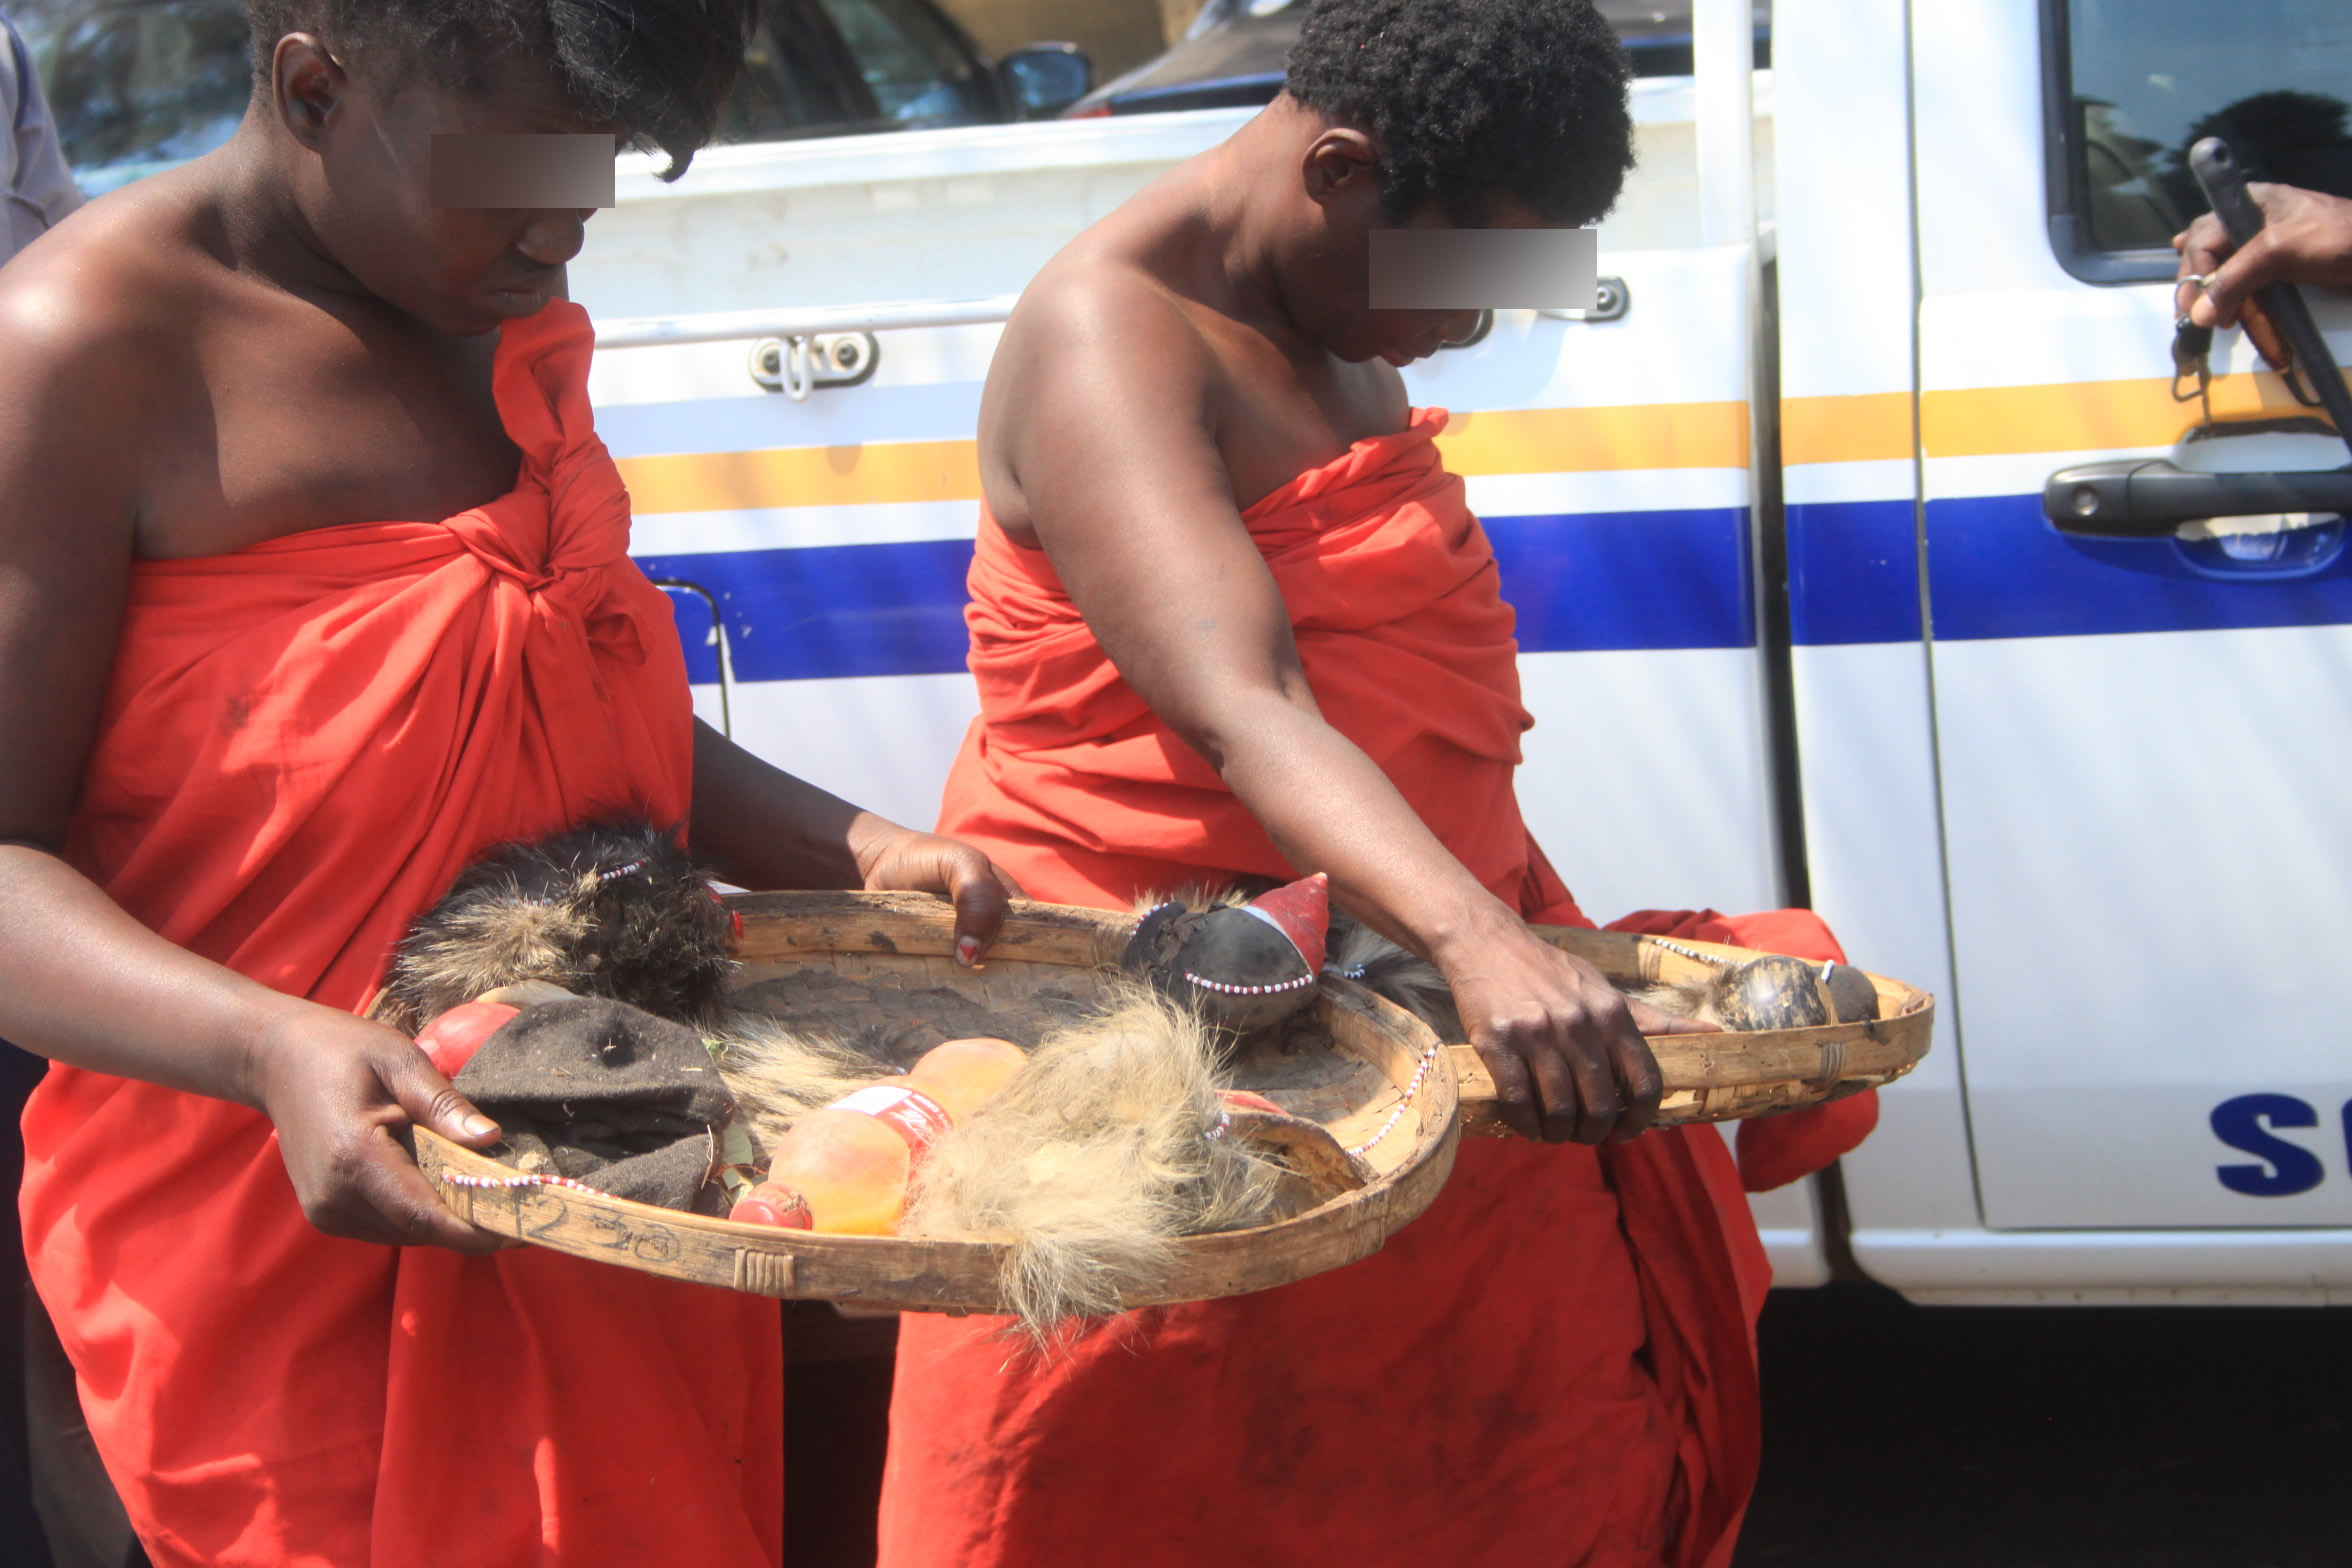 Sri lankan naked pics-7511